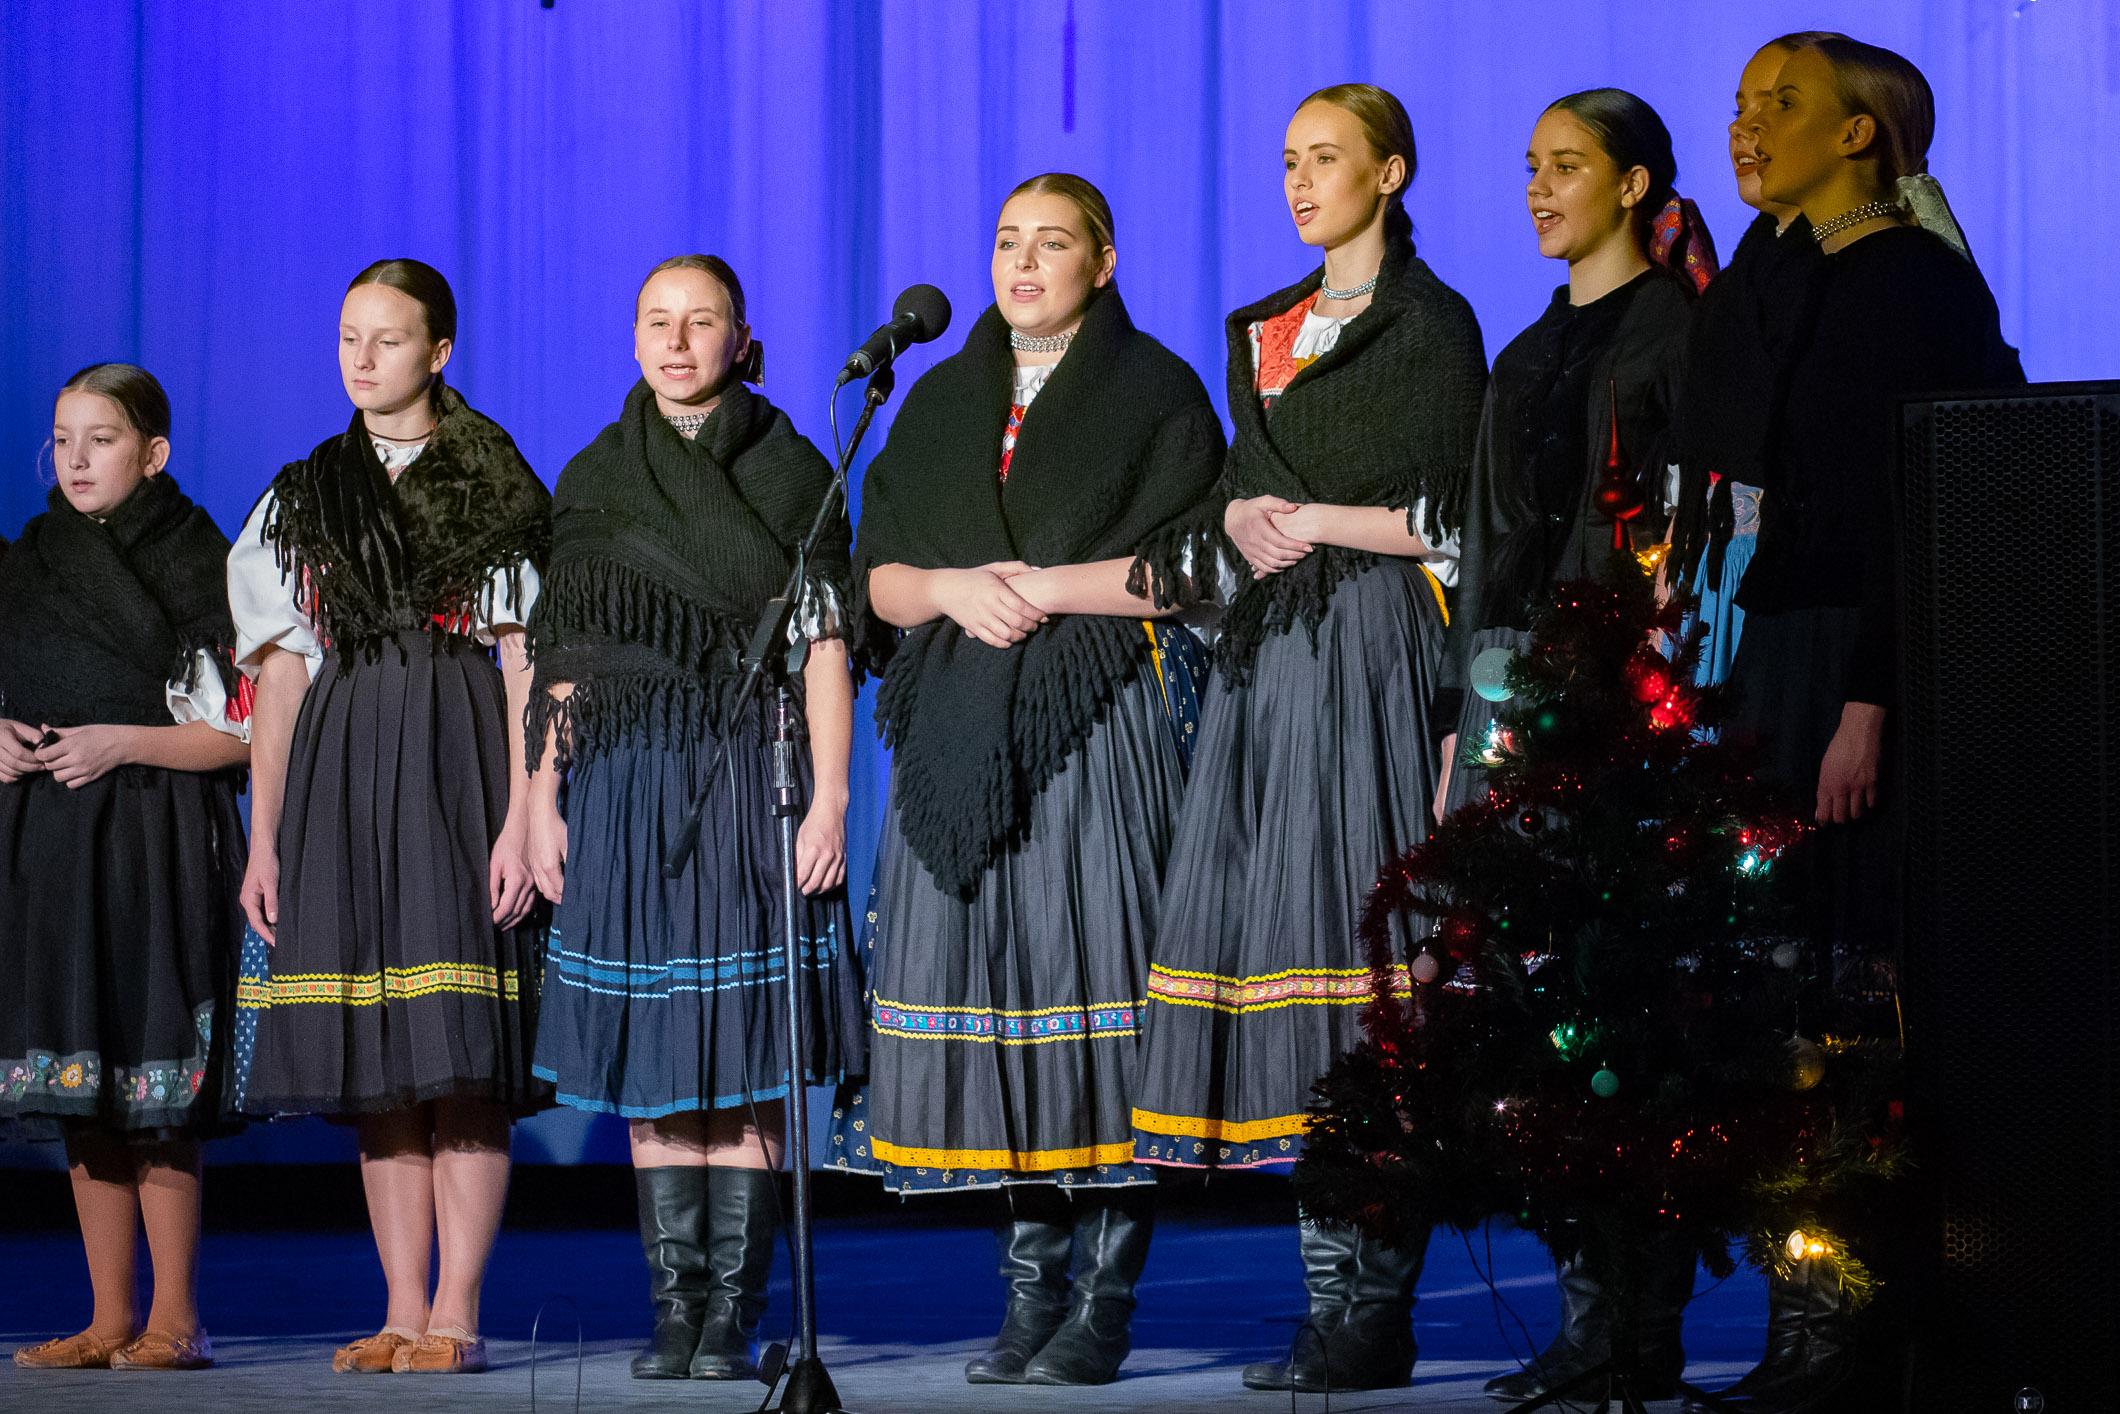 nadych-vianoc-zornicka-marina-40